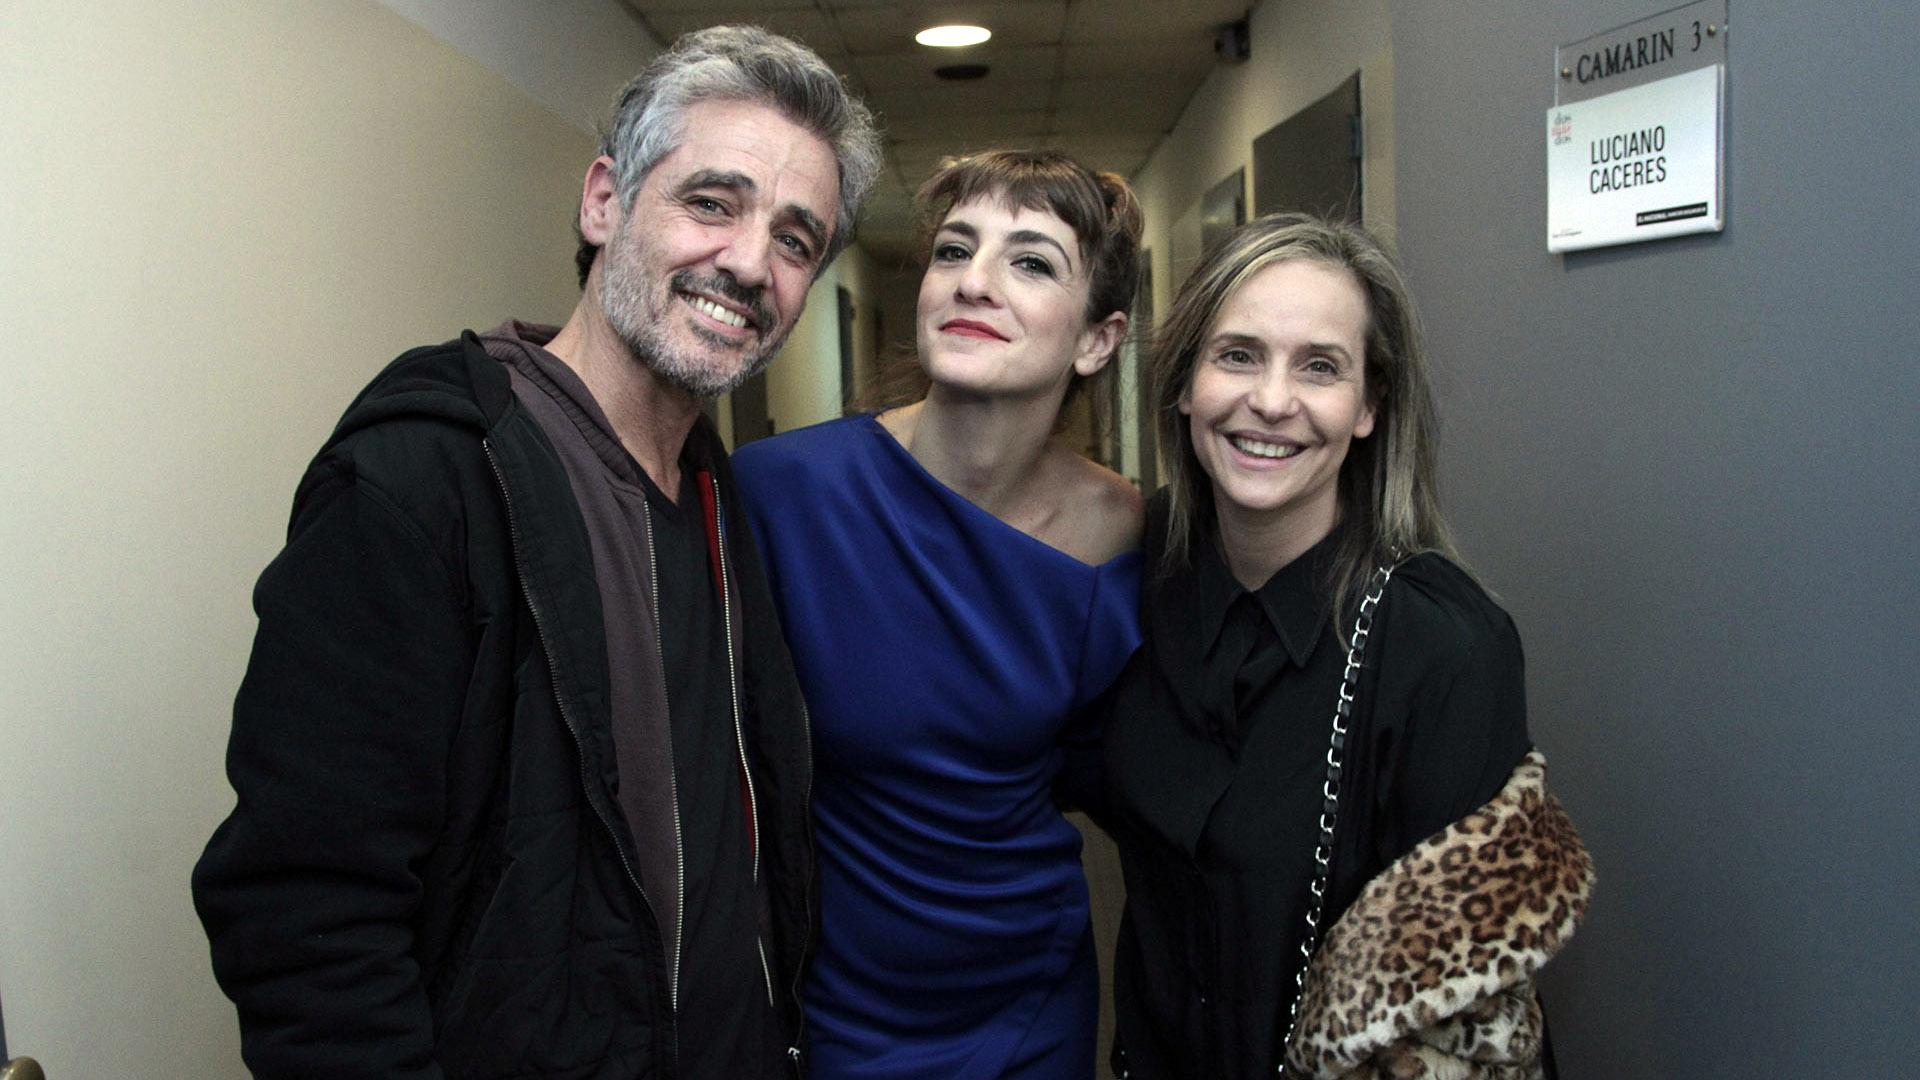 Germán Palacios, Julieta Zylberbberg y Gabriela Toscano (C.Oppizzi)